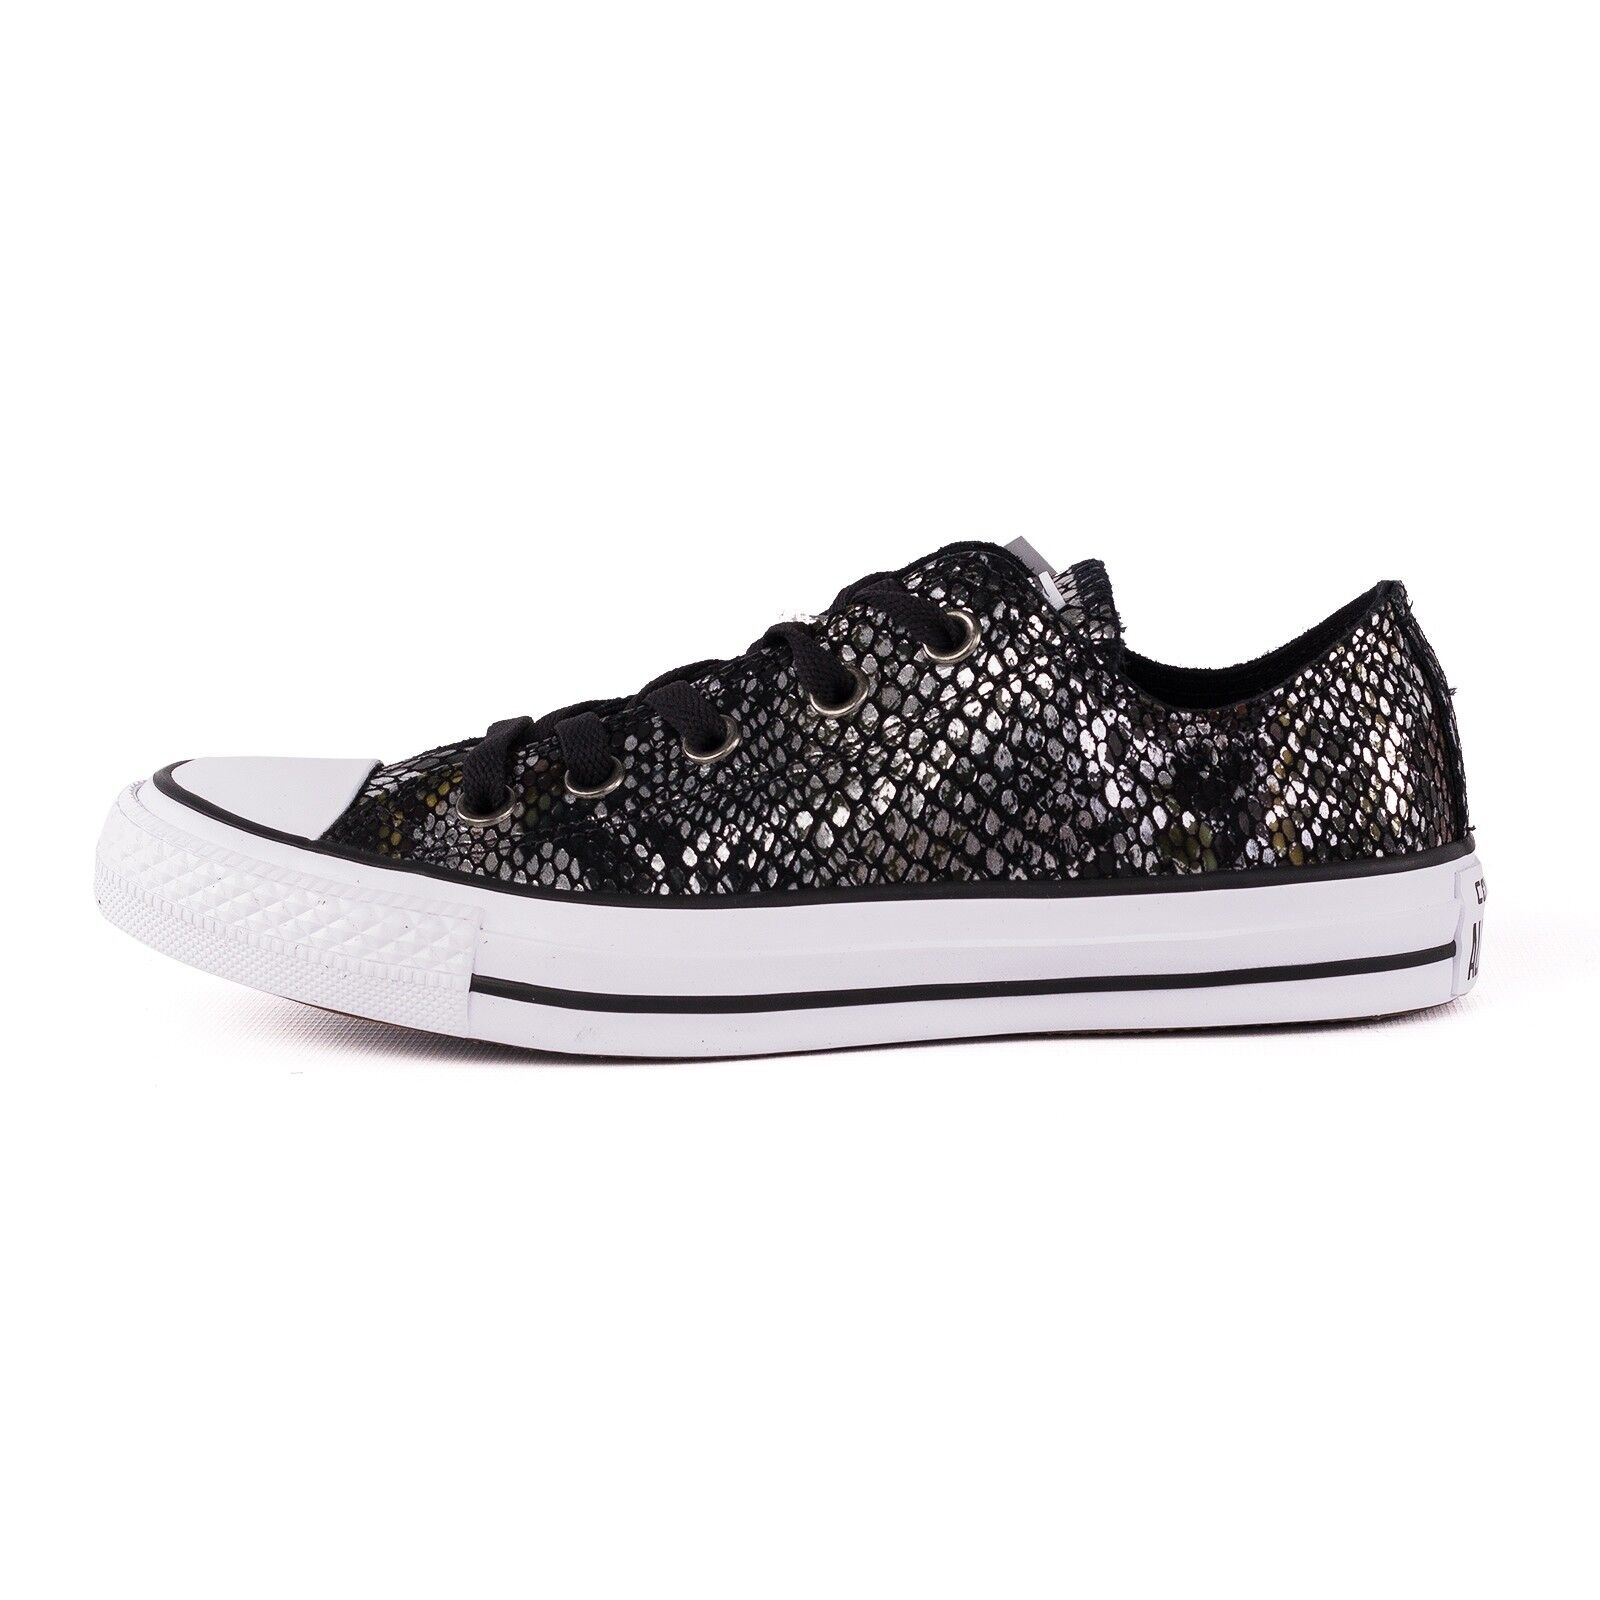 Converse verres Ox Femmes Chaussure baskets Noir 51321